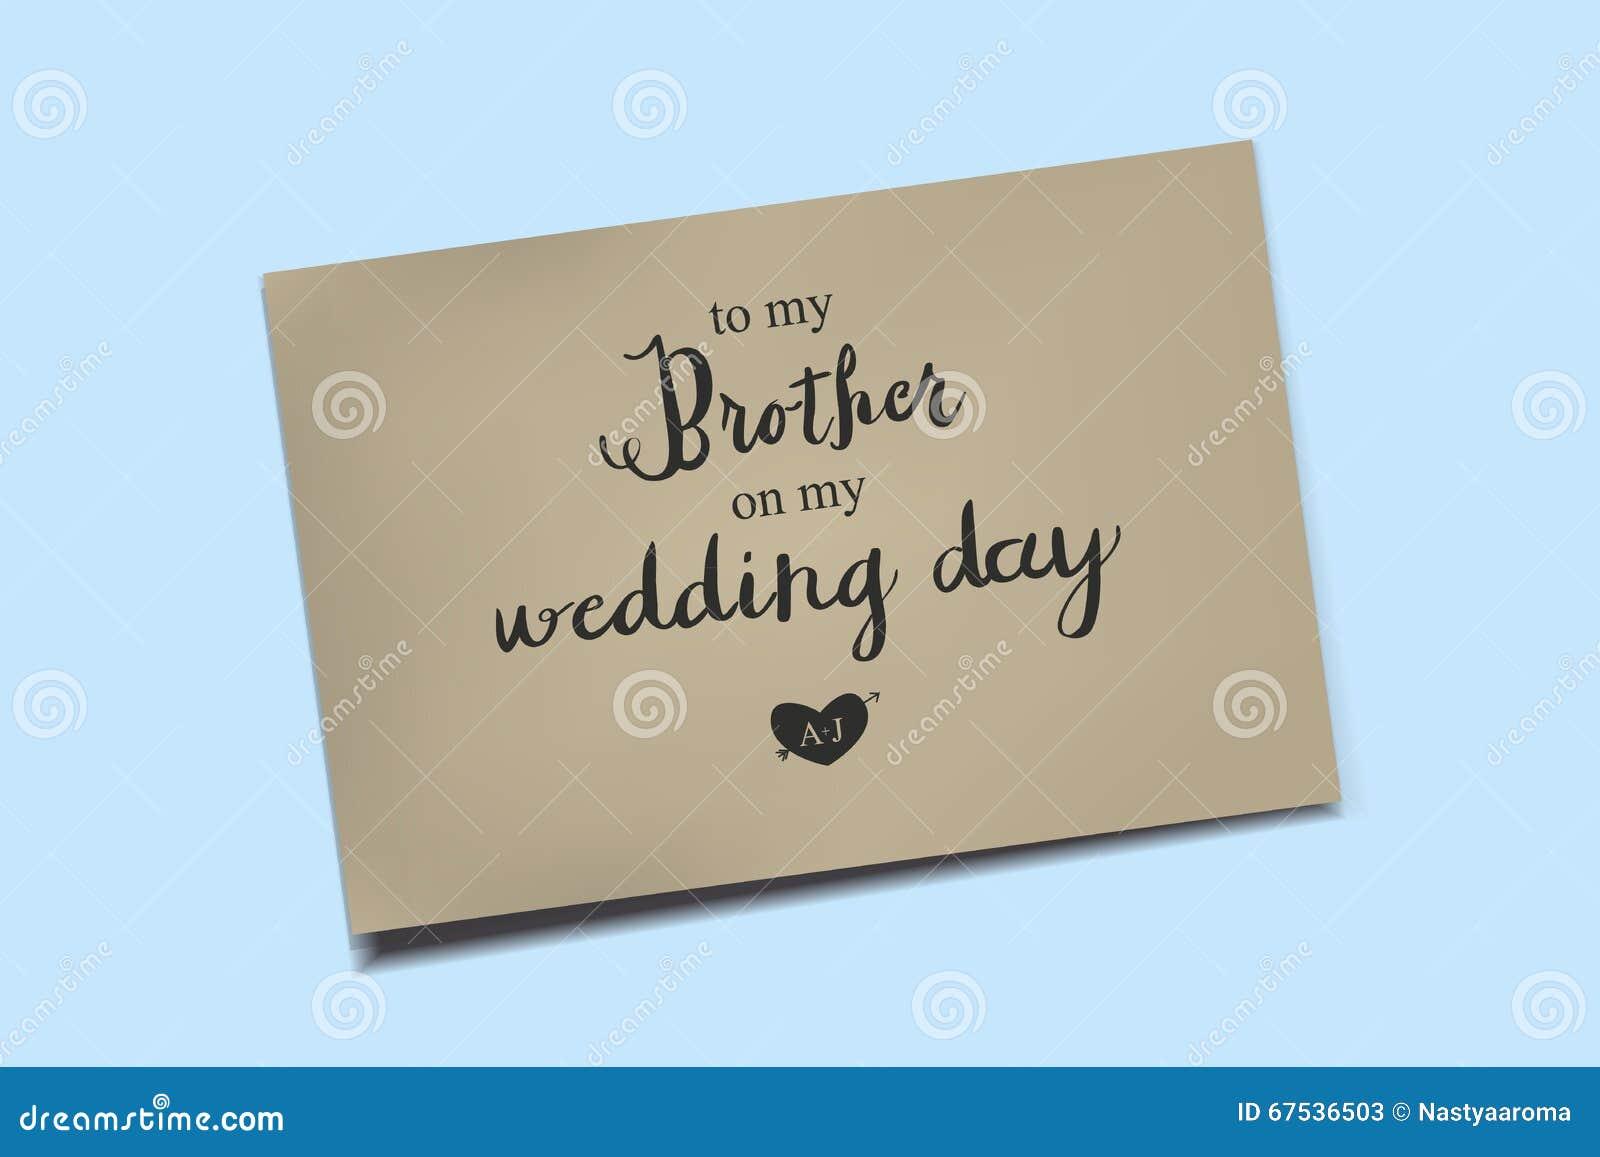 thank you card on my wedding day stock illustration illustration